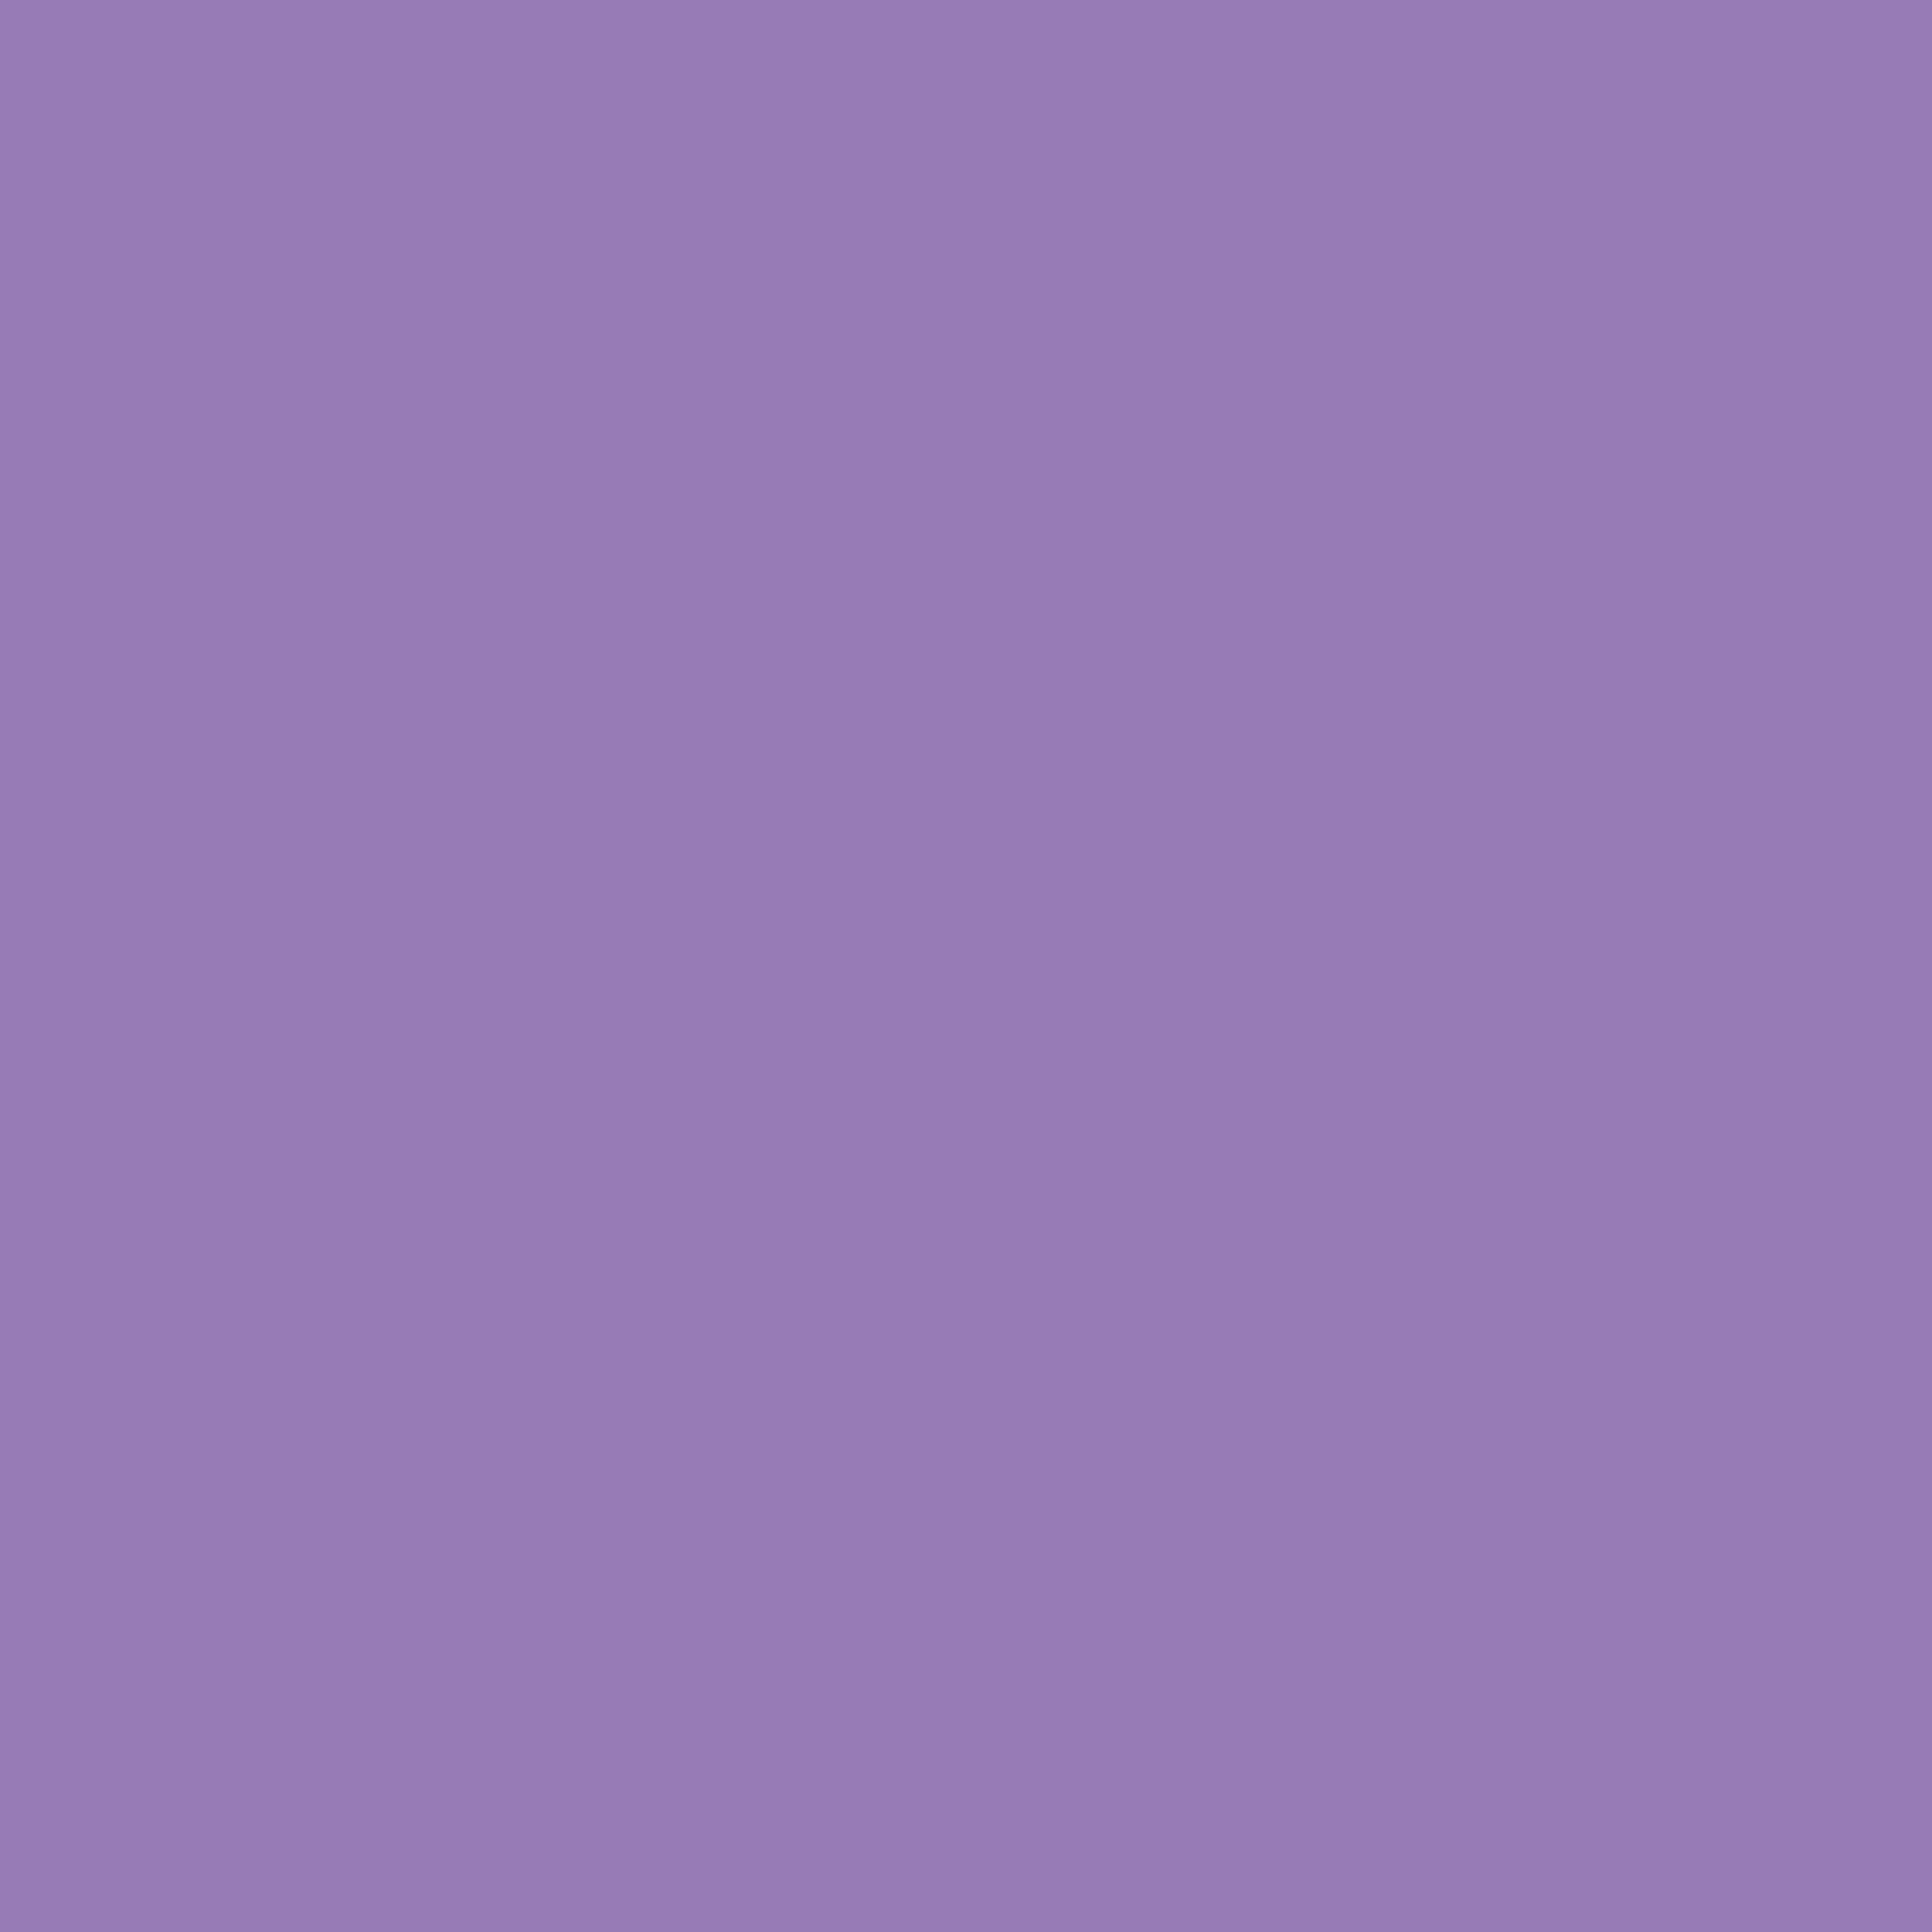 2048x2048 lavender purple solid color background - Wallpaper lavender color ...